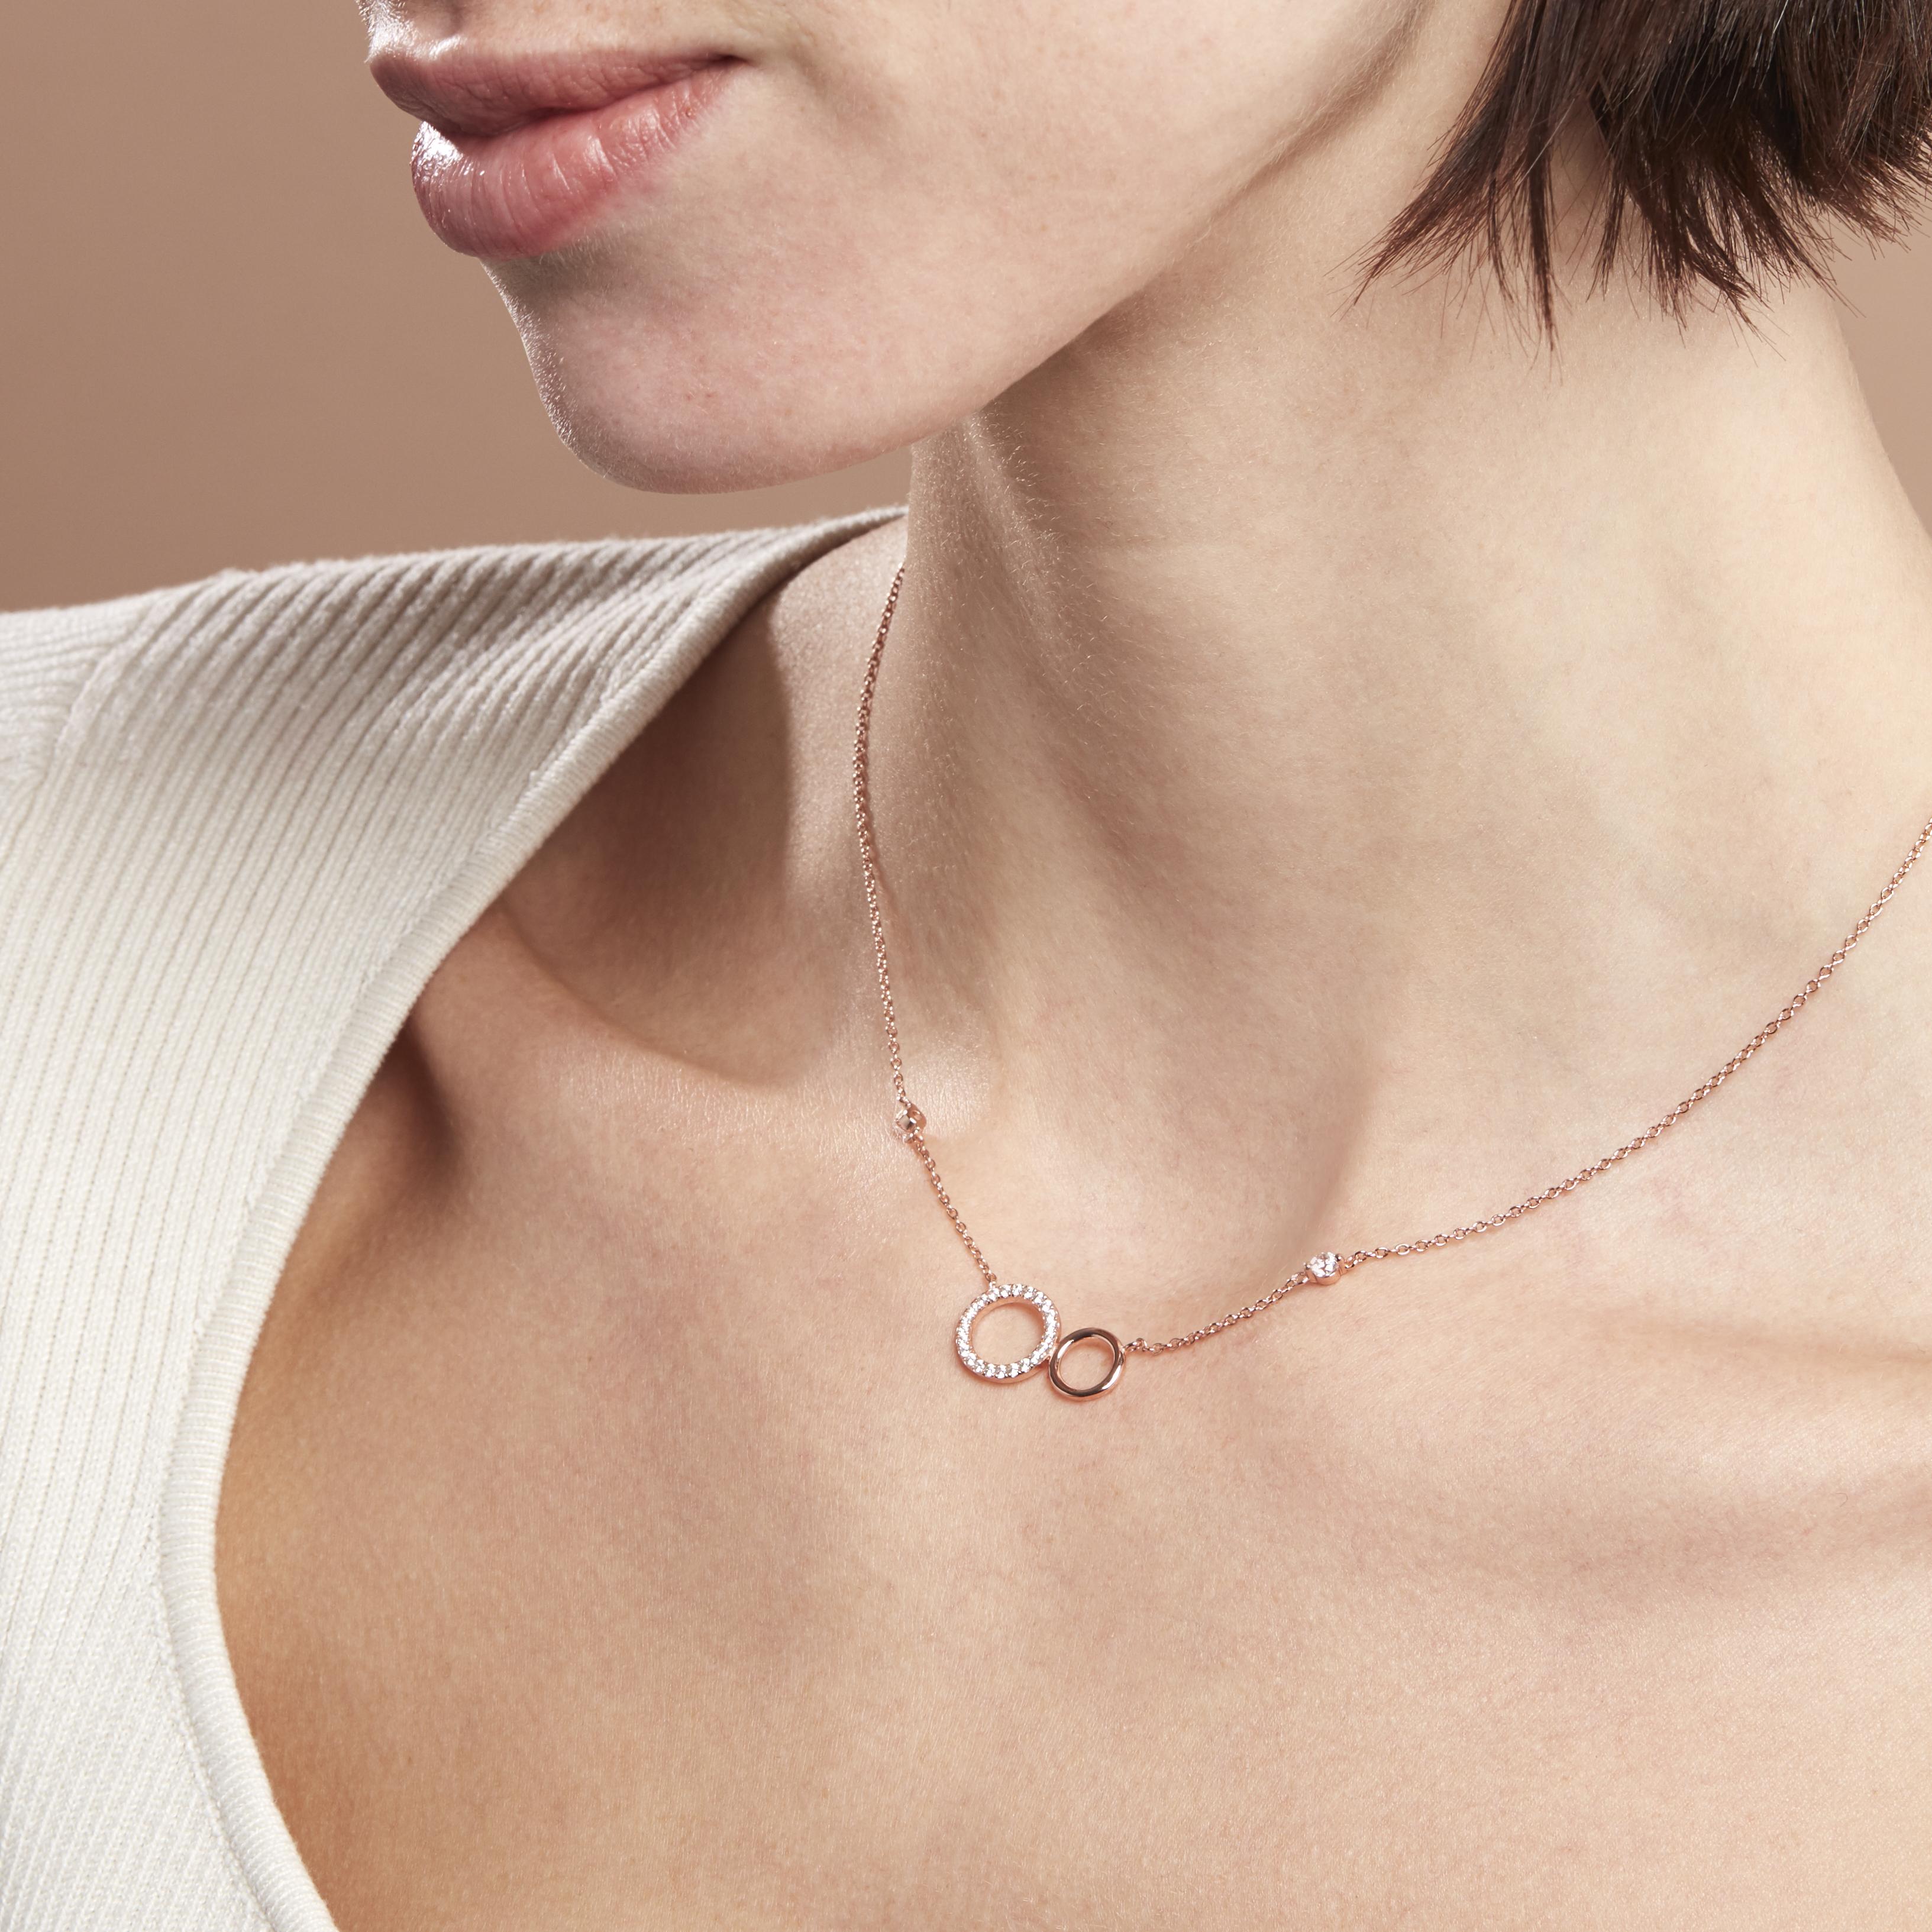 Damen Halskette Silber 925 Rosé Vergoldet